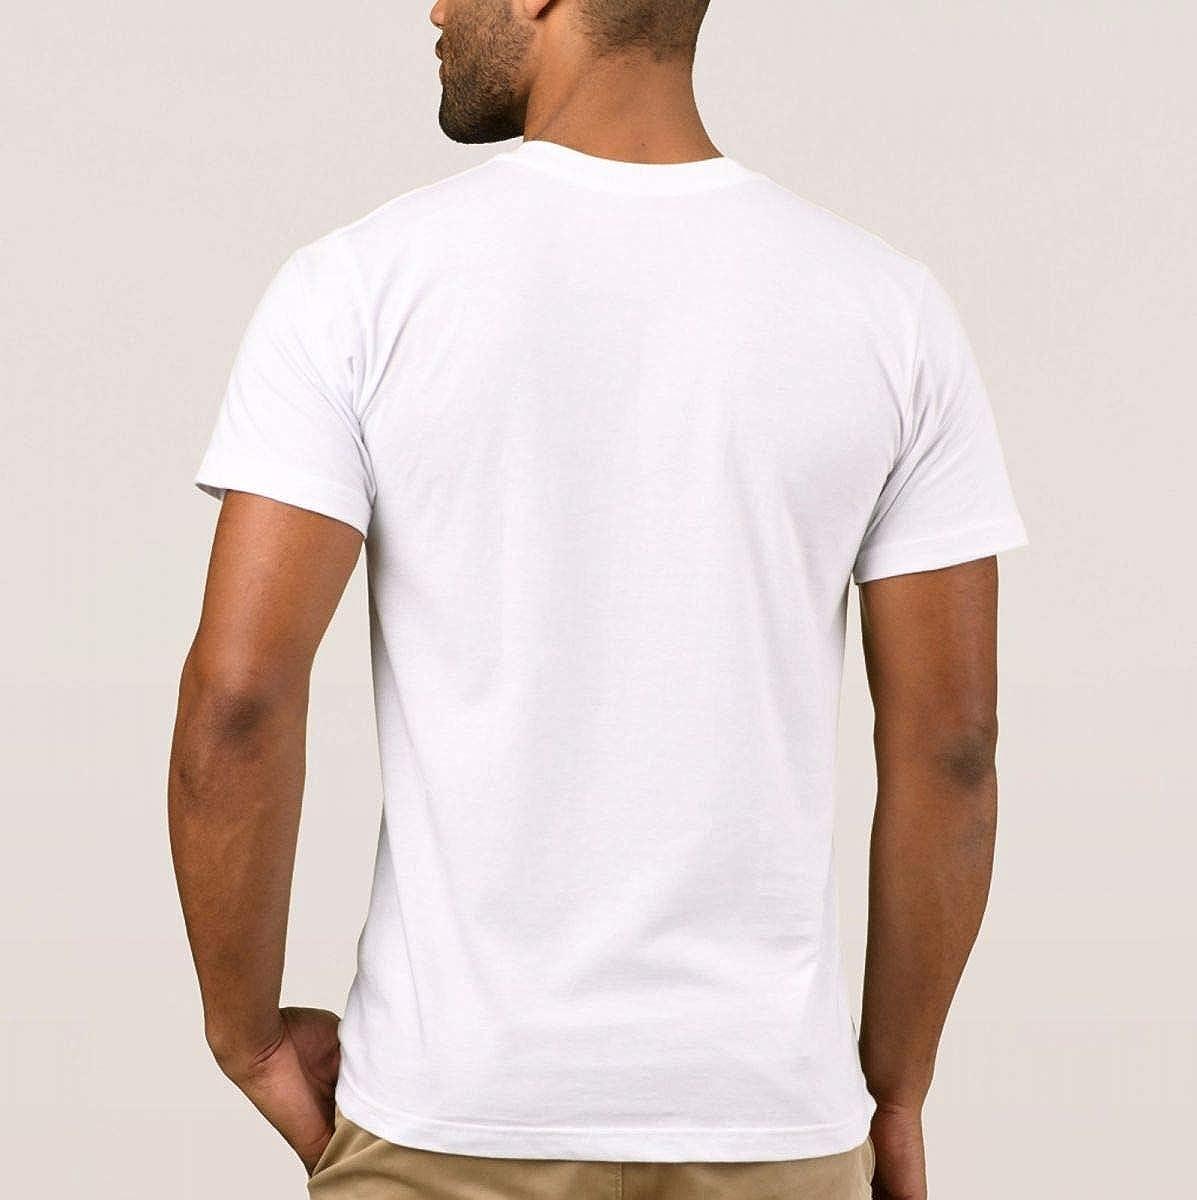 Caesar Melville Mens Maserati Logo Short Sleeve T-Shirts Top Tees